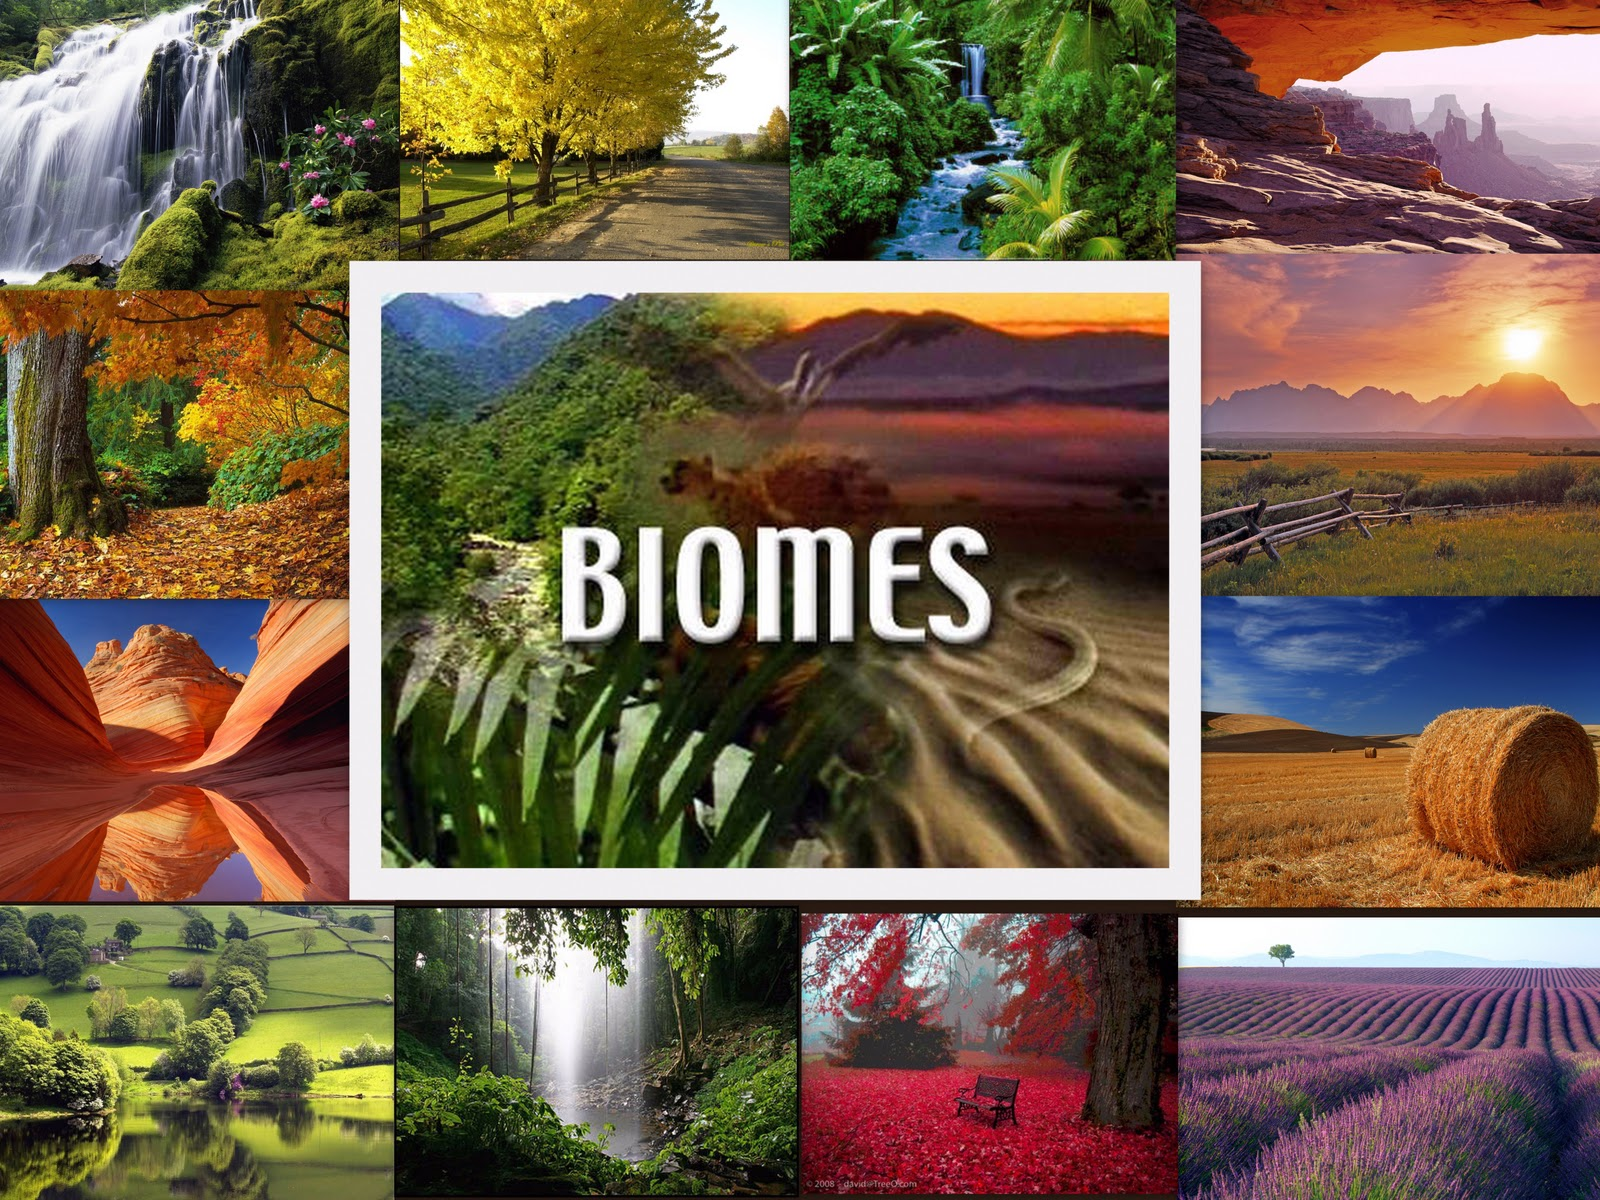 Altering Biomes